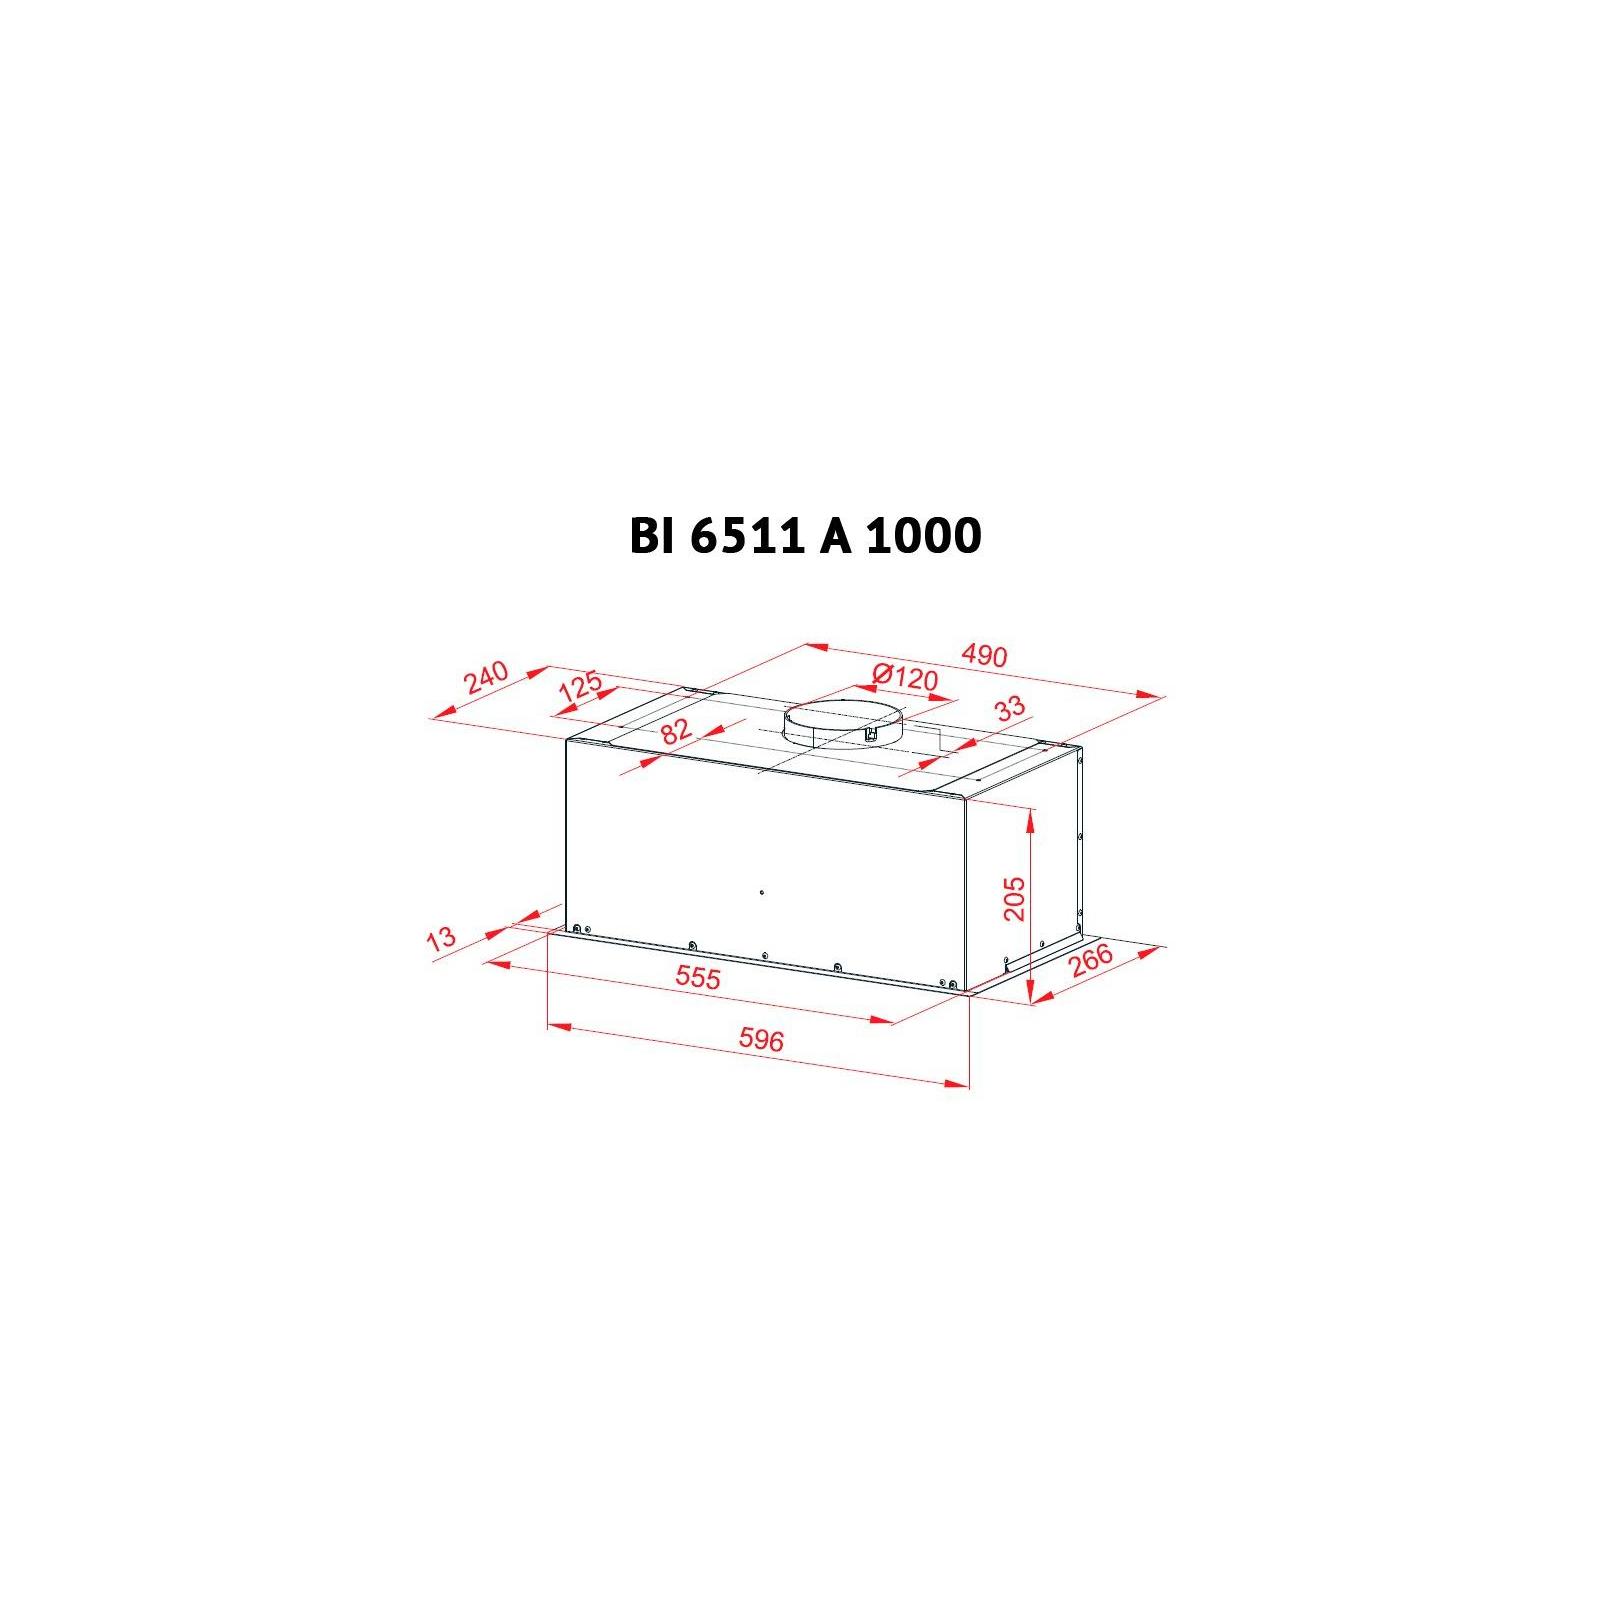 Вытяжка кухонная PERFELLI BI 6511 A 1000 I изображение 7